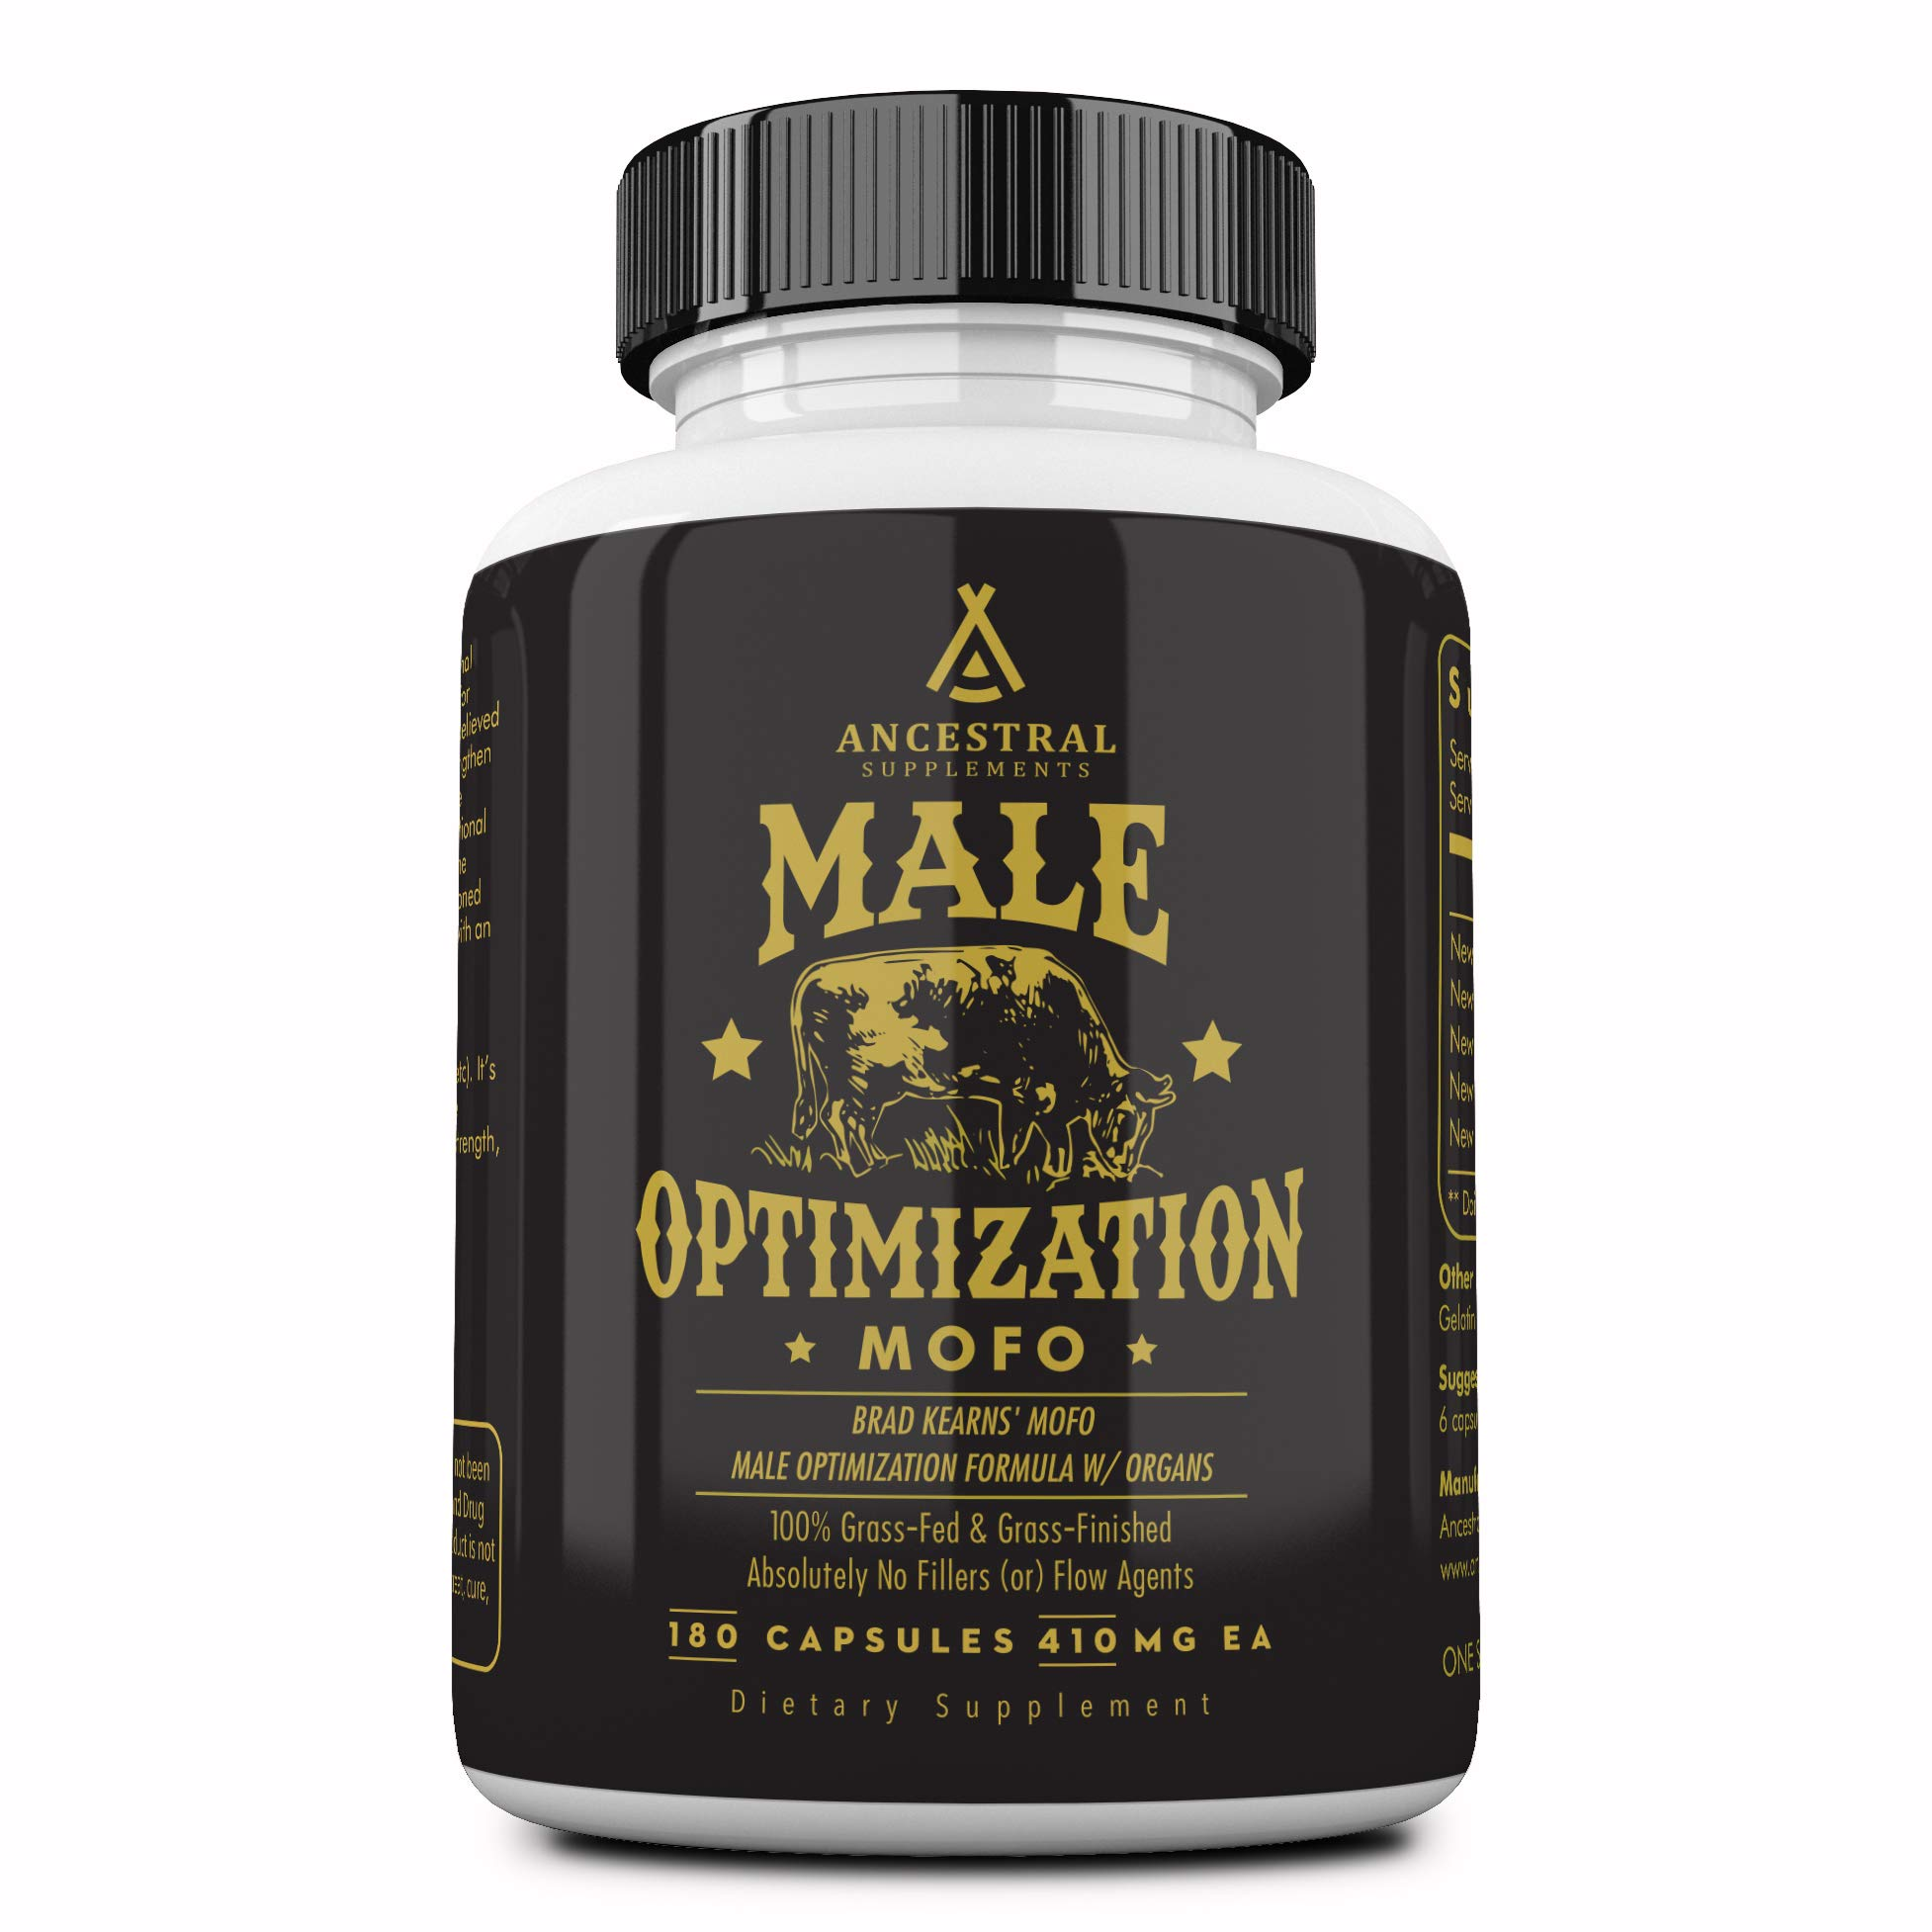 Mofo is Ancestral Supplements Male Optimization Formula